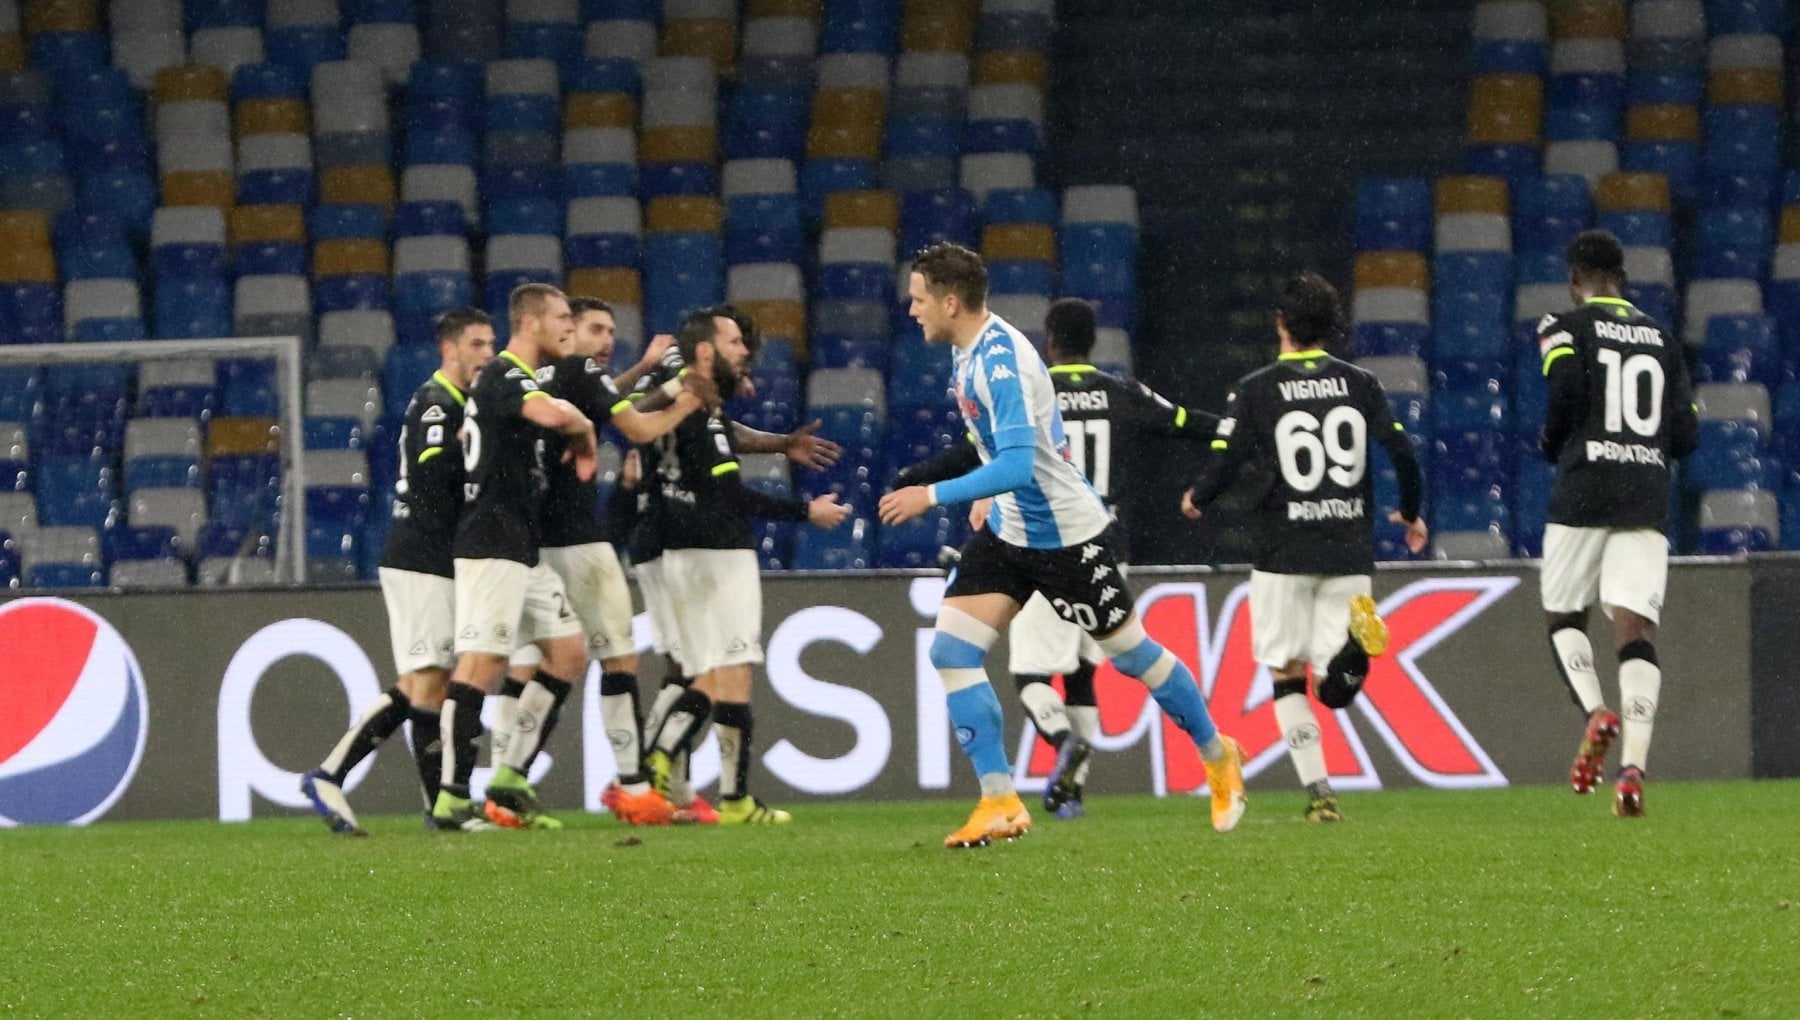 Napoli Spezia 1 2 azzurri spreconi Pobega firma limpresa in dieci